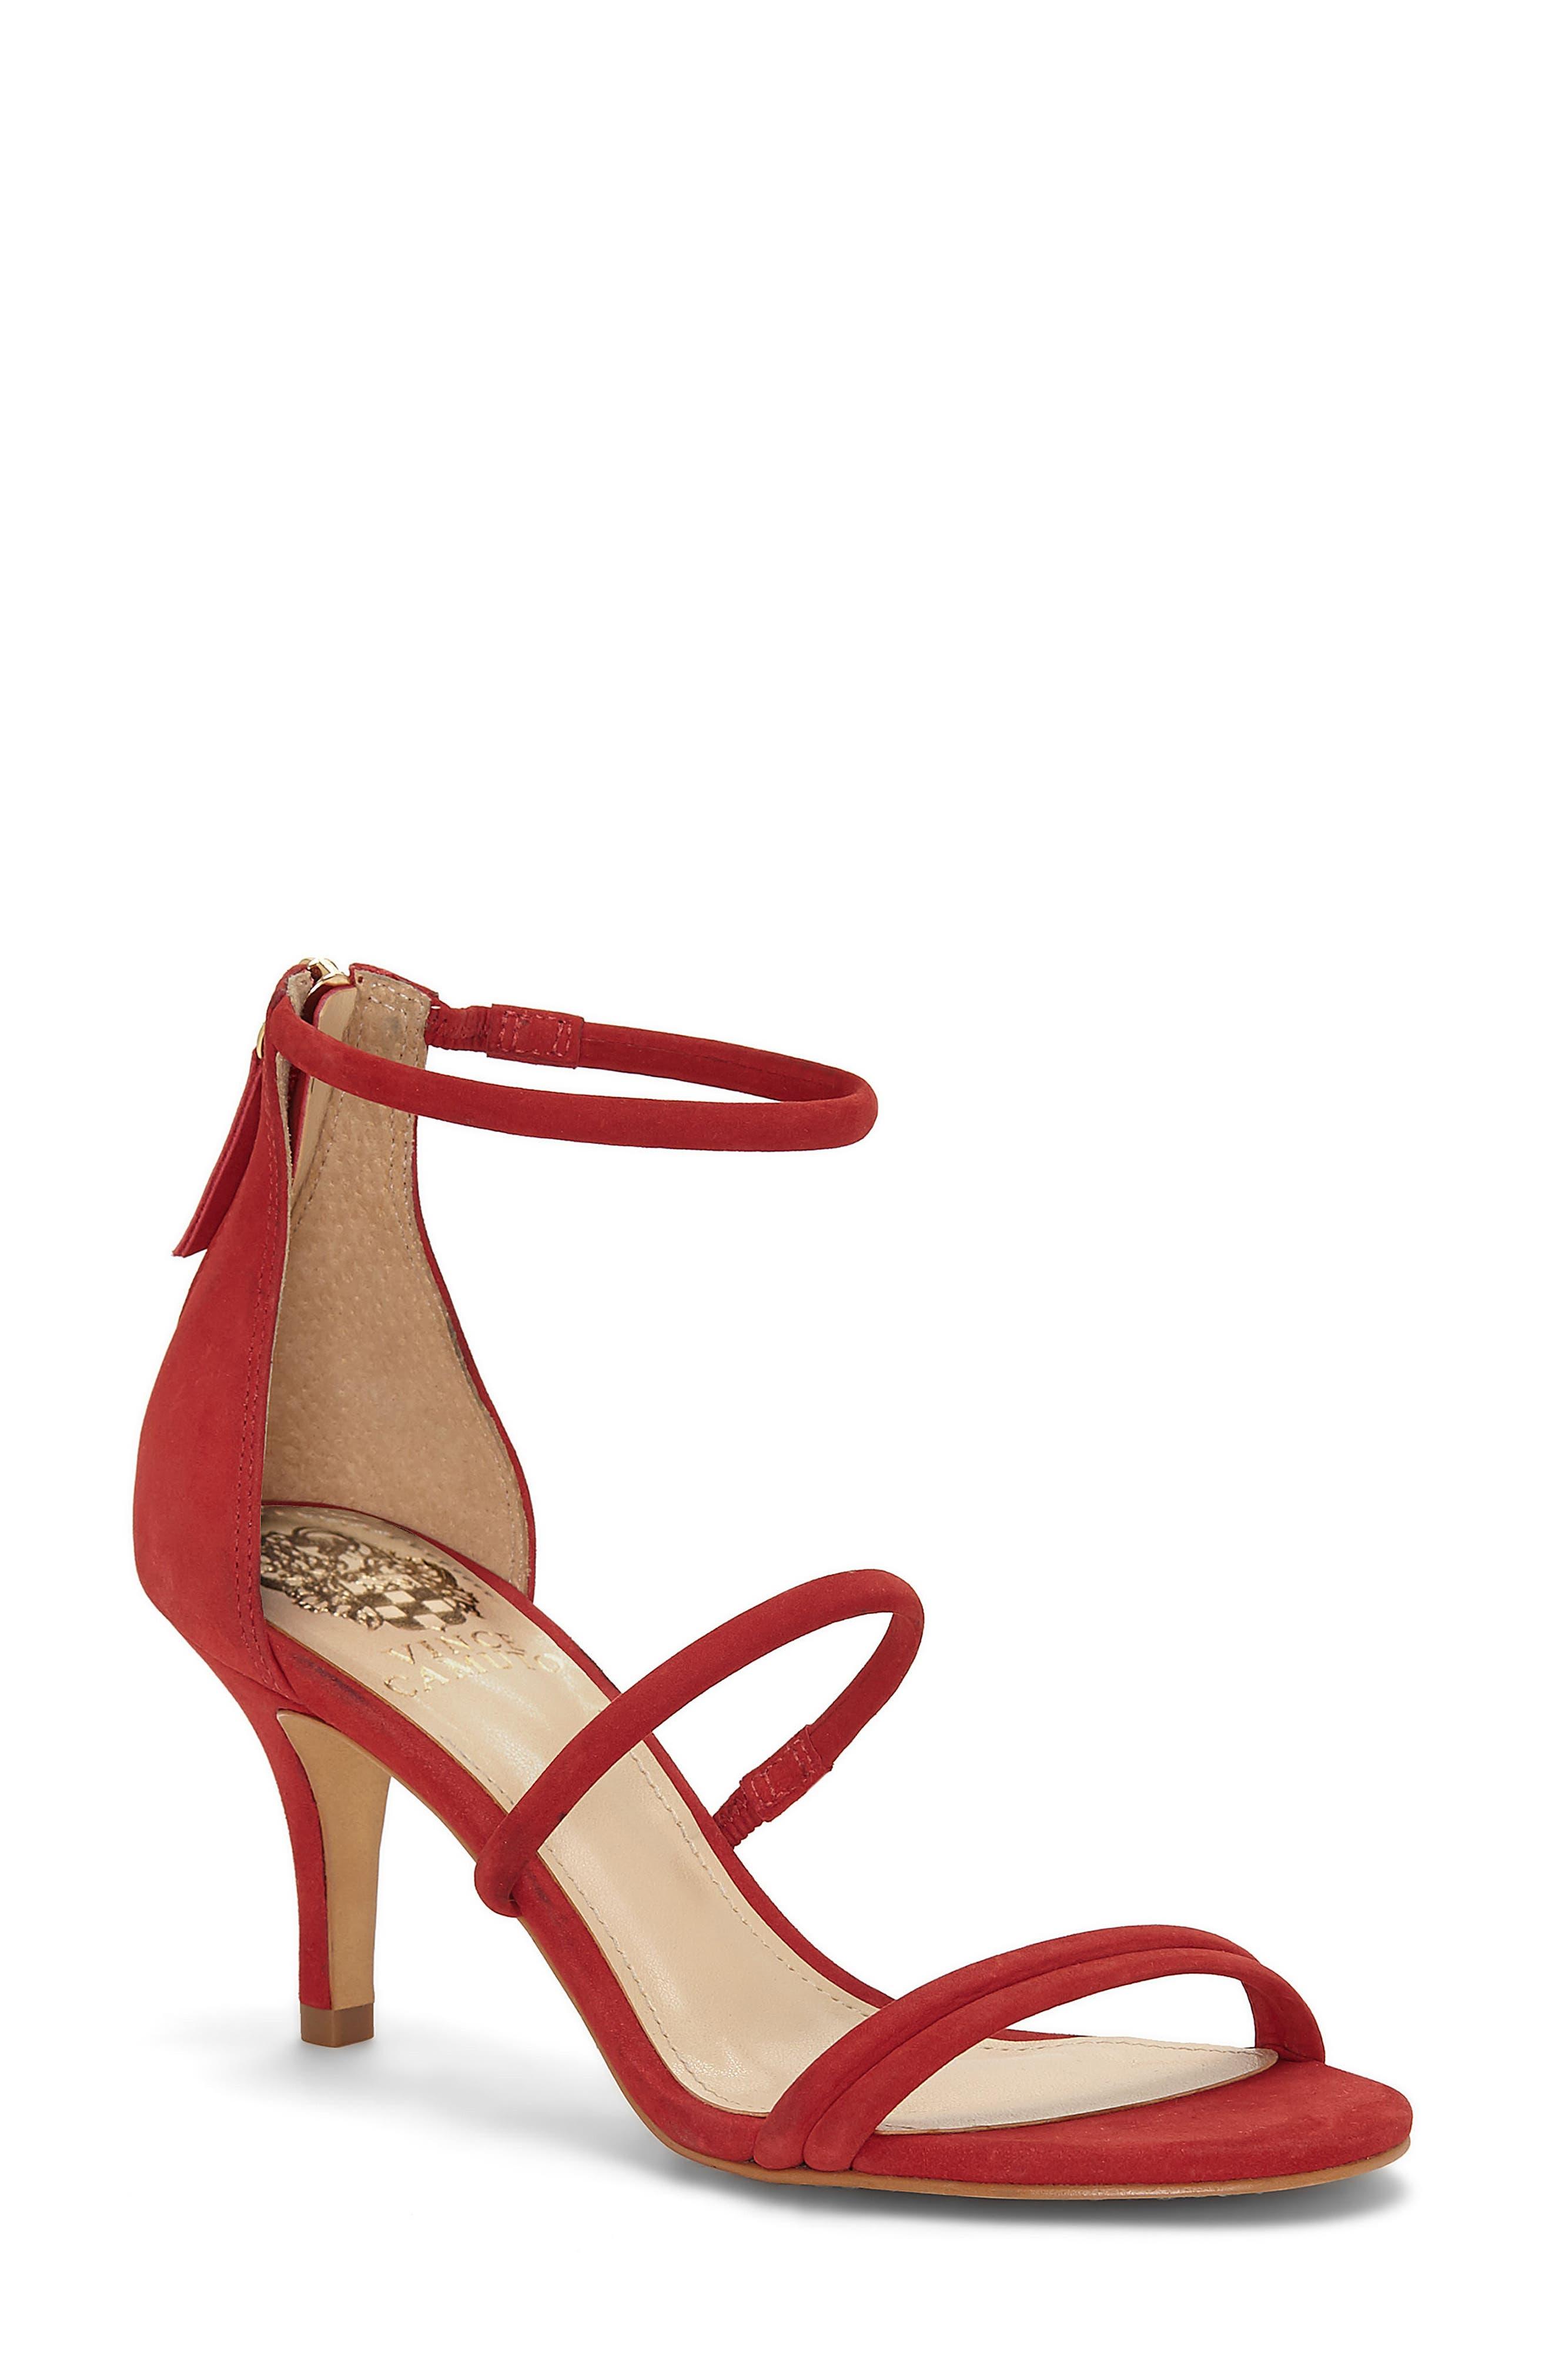 Aviran Sandal,                             Main thumbnail 1, color,                             Ruby Red Nubuck Leather